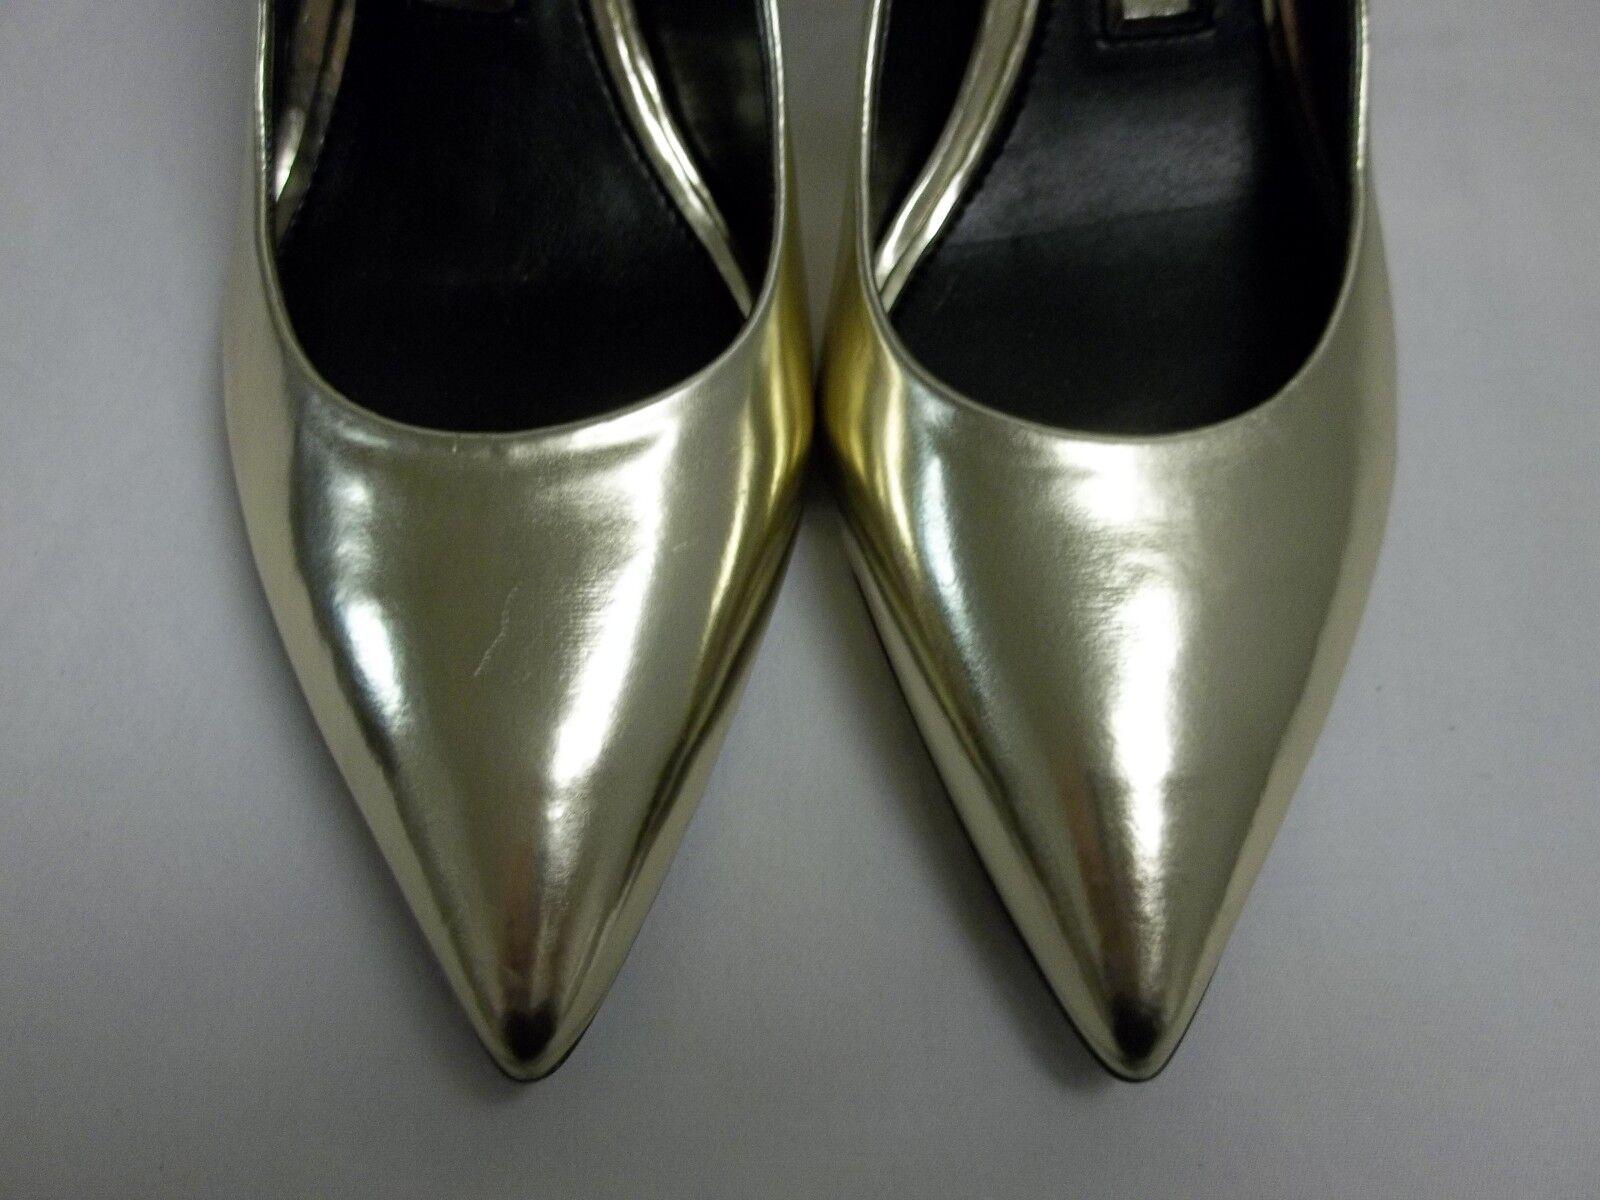 Boutique 9 Größe 9.5 Pumps M Mirabelle Light Gold Pumps 9.5 New Damenschuhe Schuhes 05a512